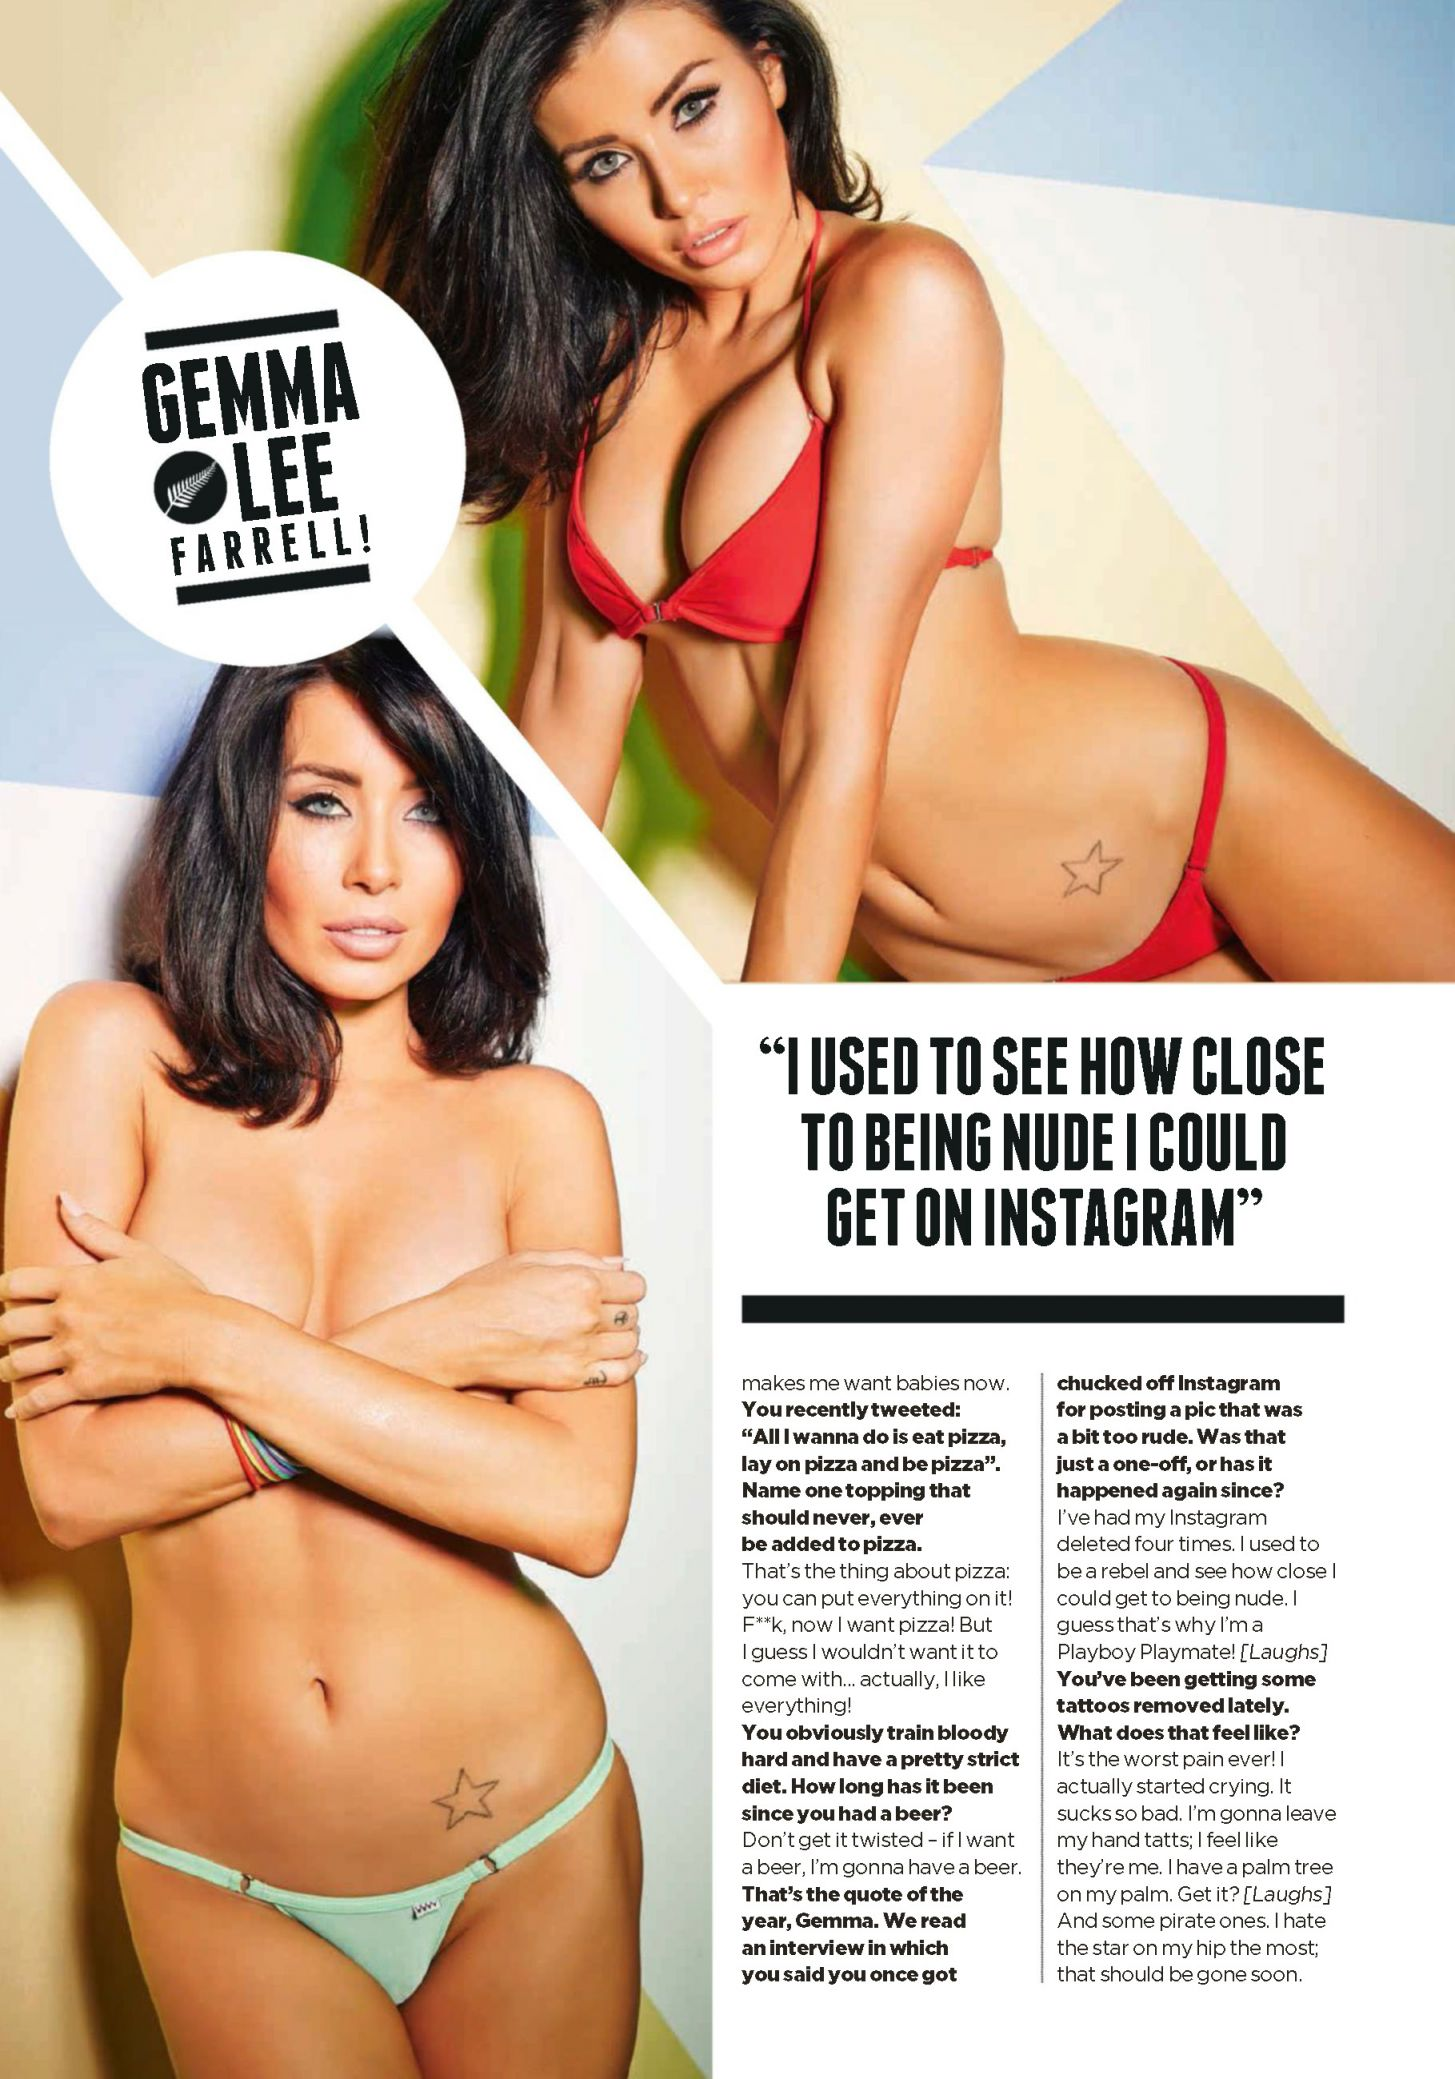 Gemma Lee Farrell Nude Delightful gemma lee farrell in a bikini & topless (8 photos) | #thefappening